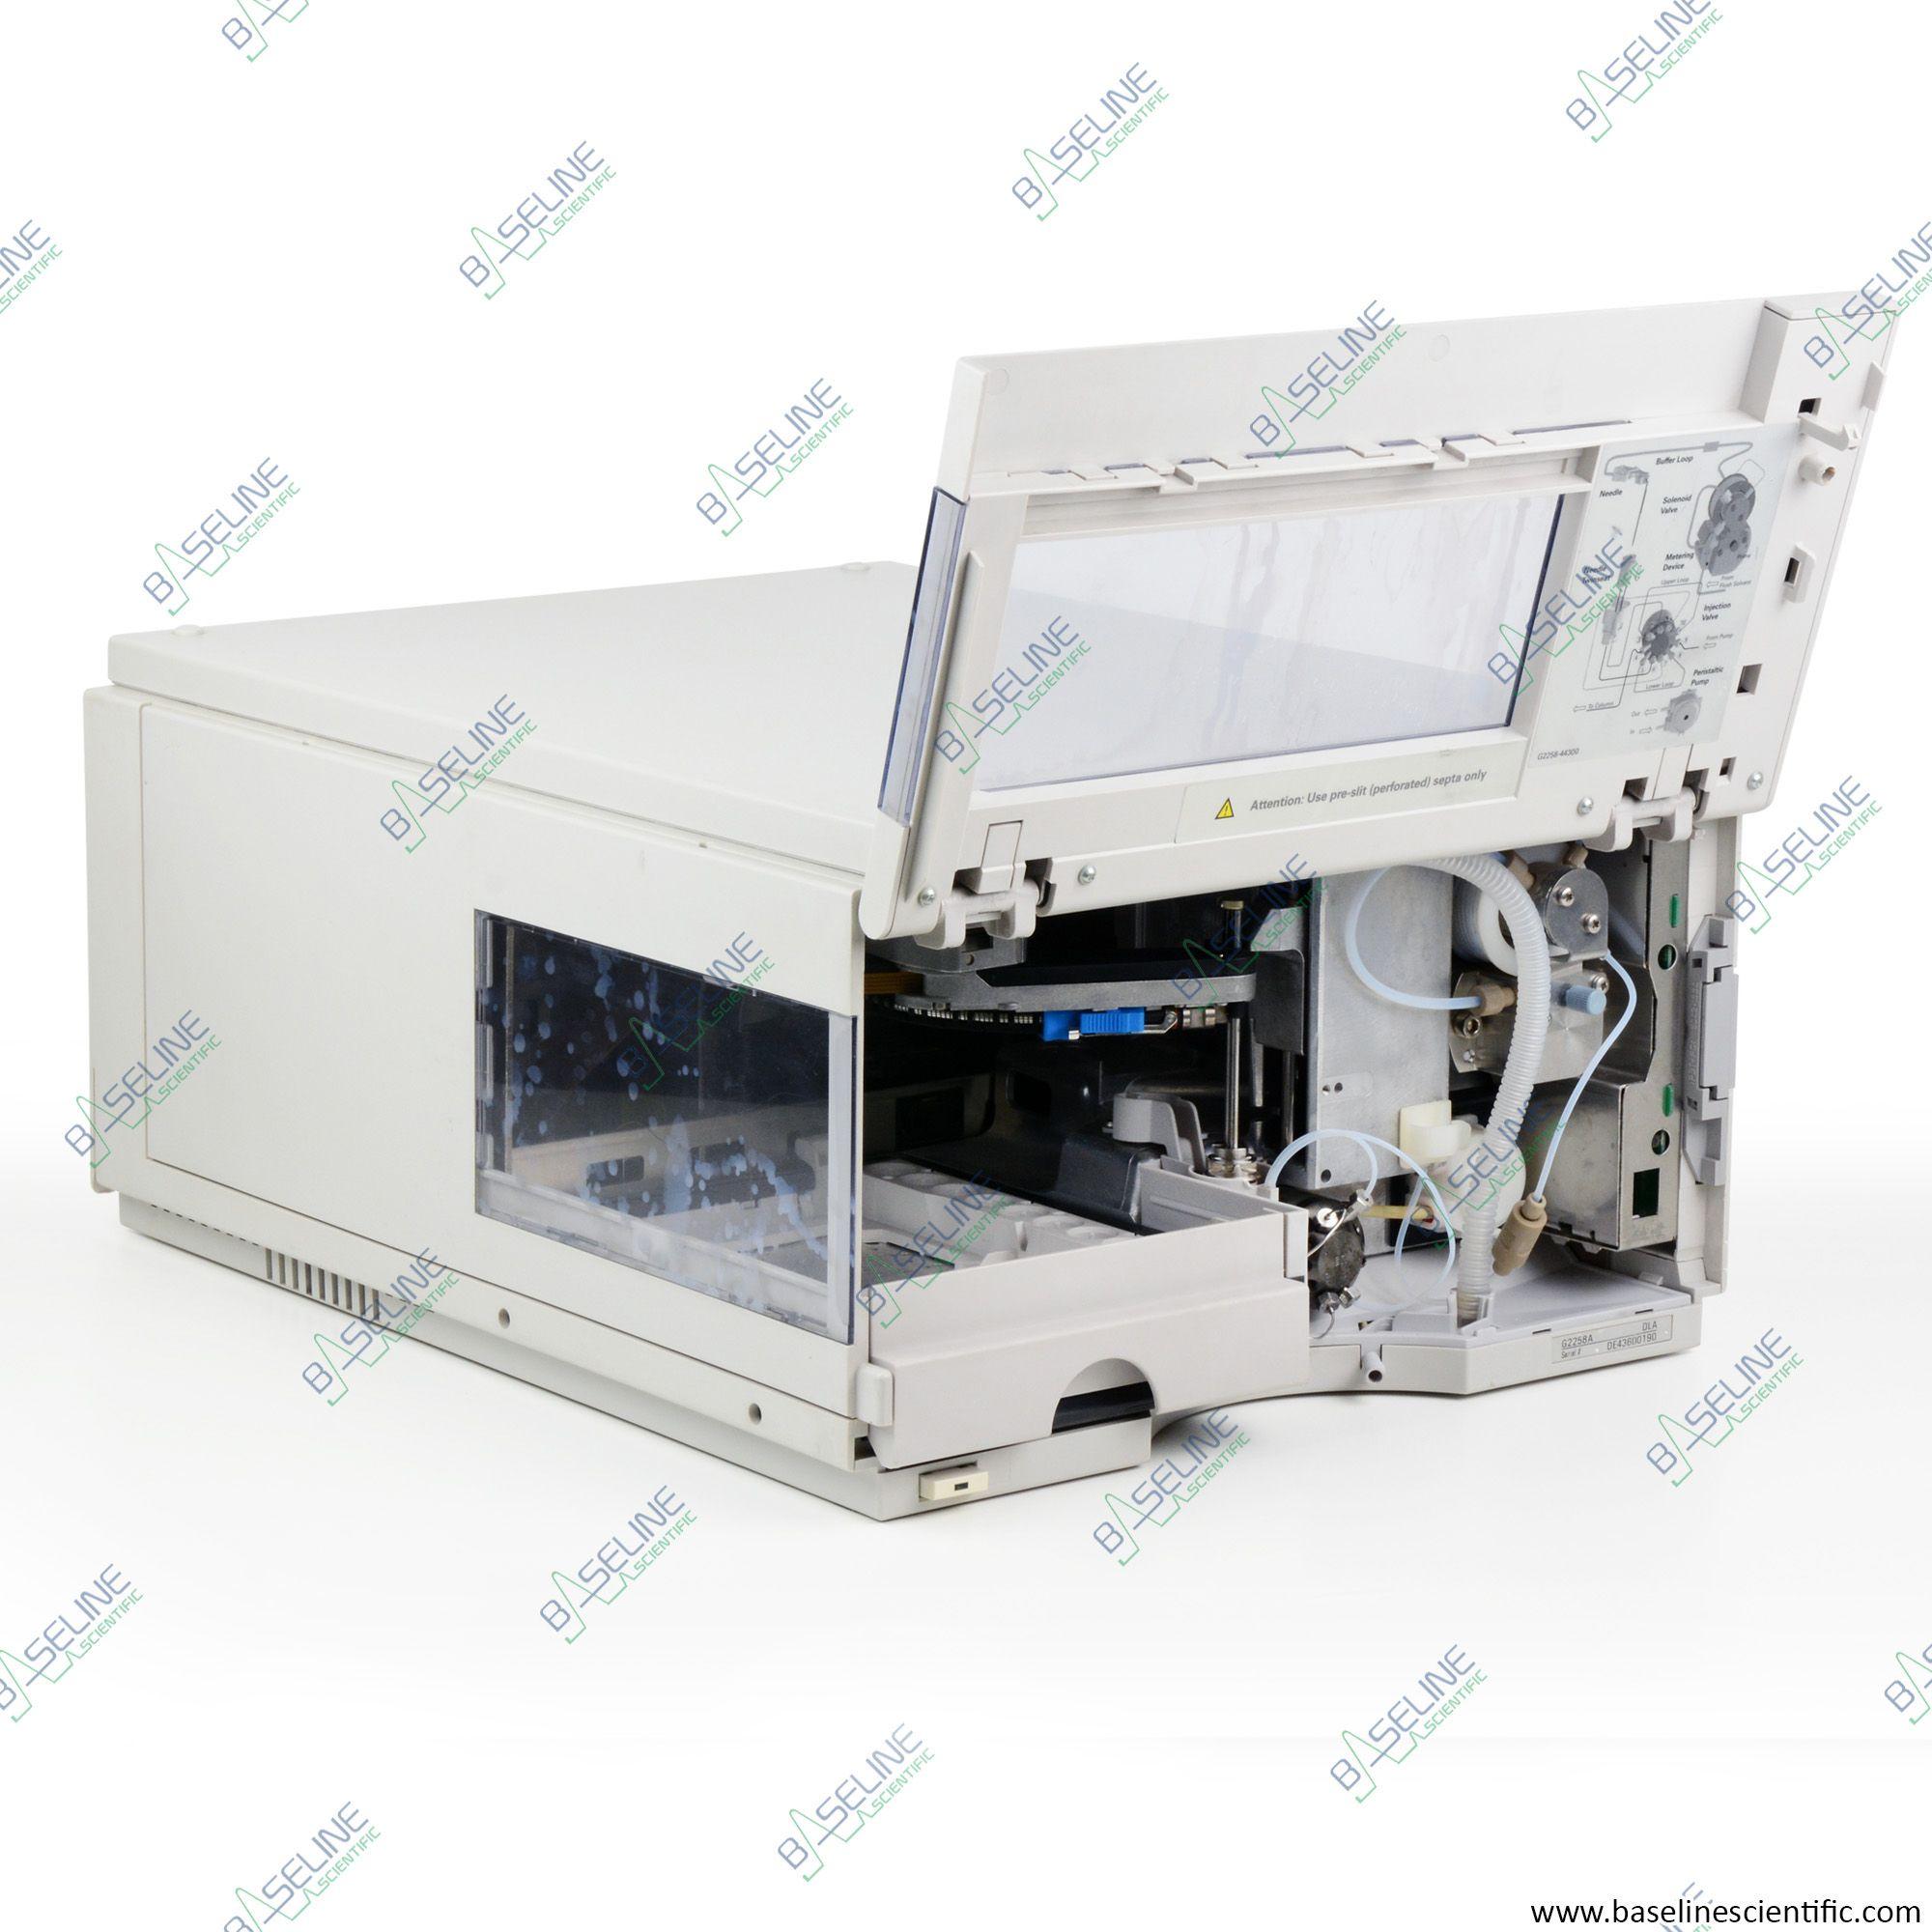 Refurbished Agilent HP 1100 G2258A DLA Autosampler with ONE YEAR WARRANTY